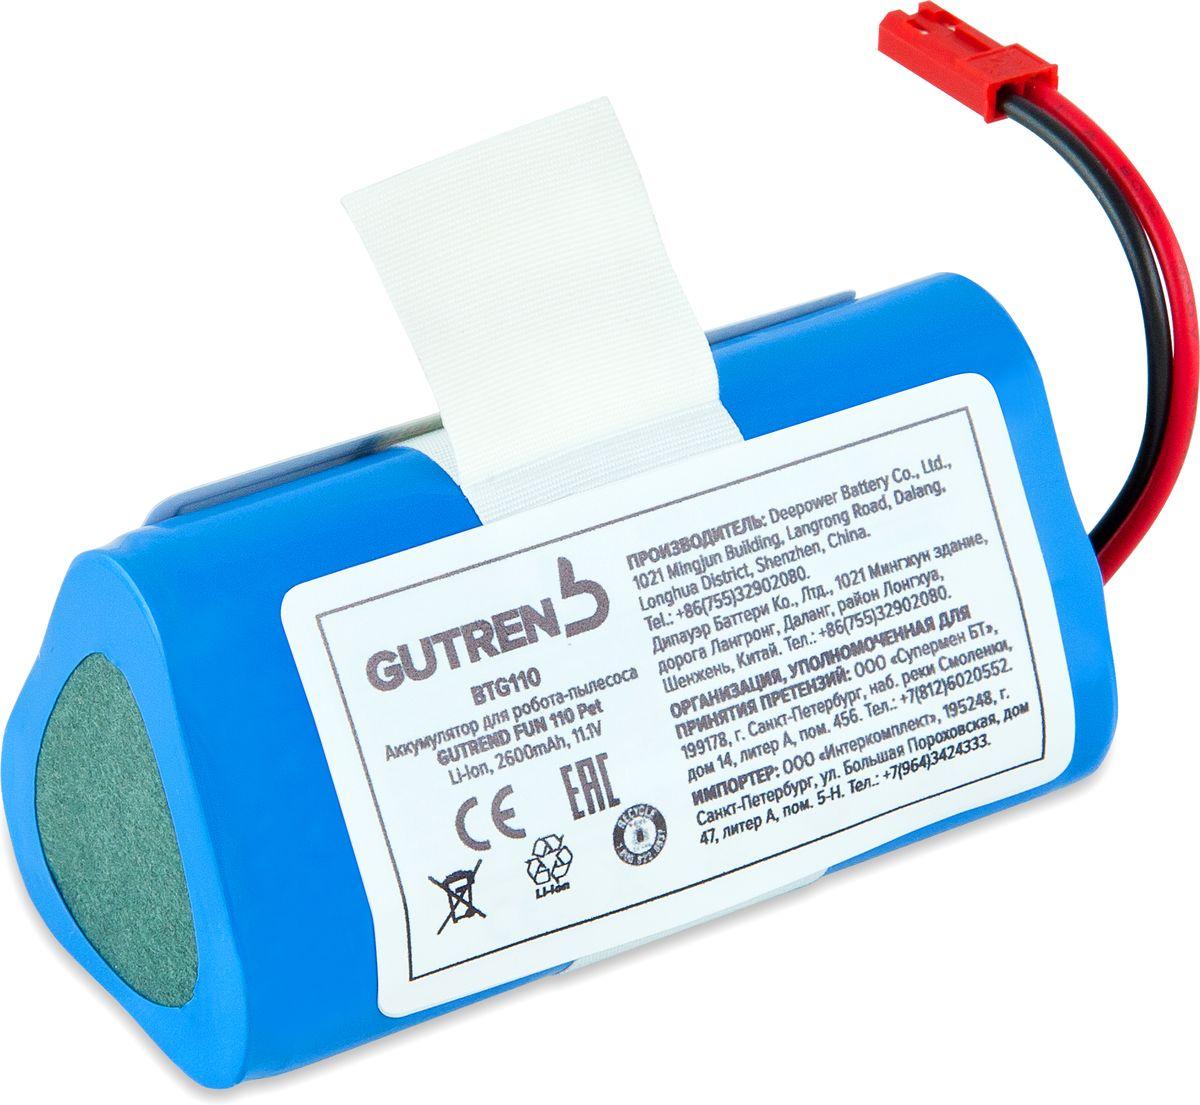 Gutrend BTG110 аккумуляторная батарея для Fun 110 Pet батарея аккумуляторная 3cott 12v9ah